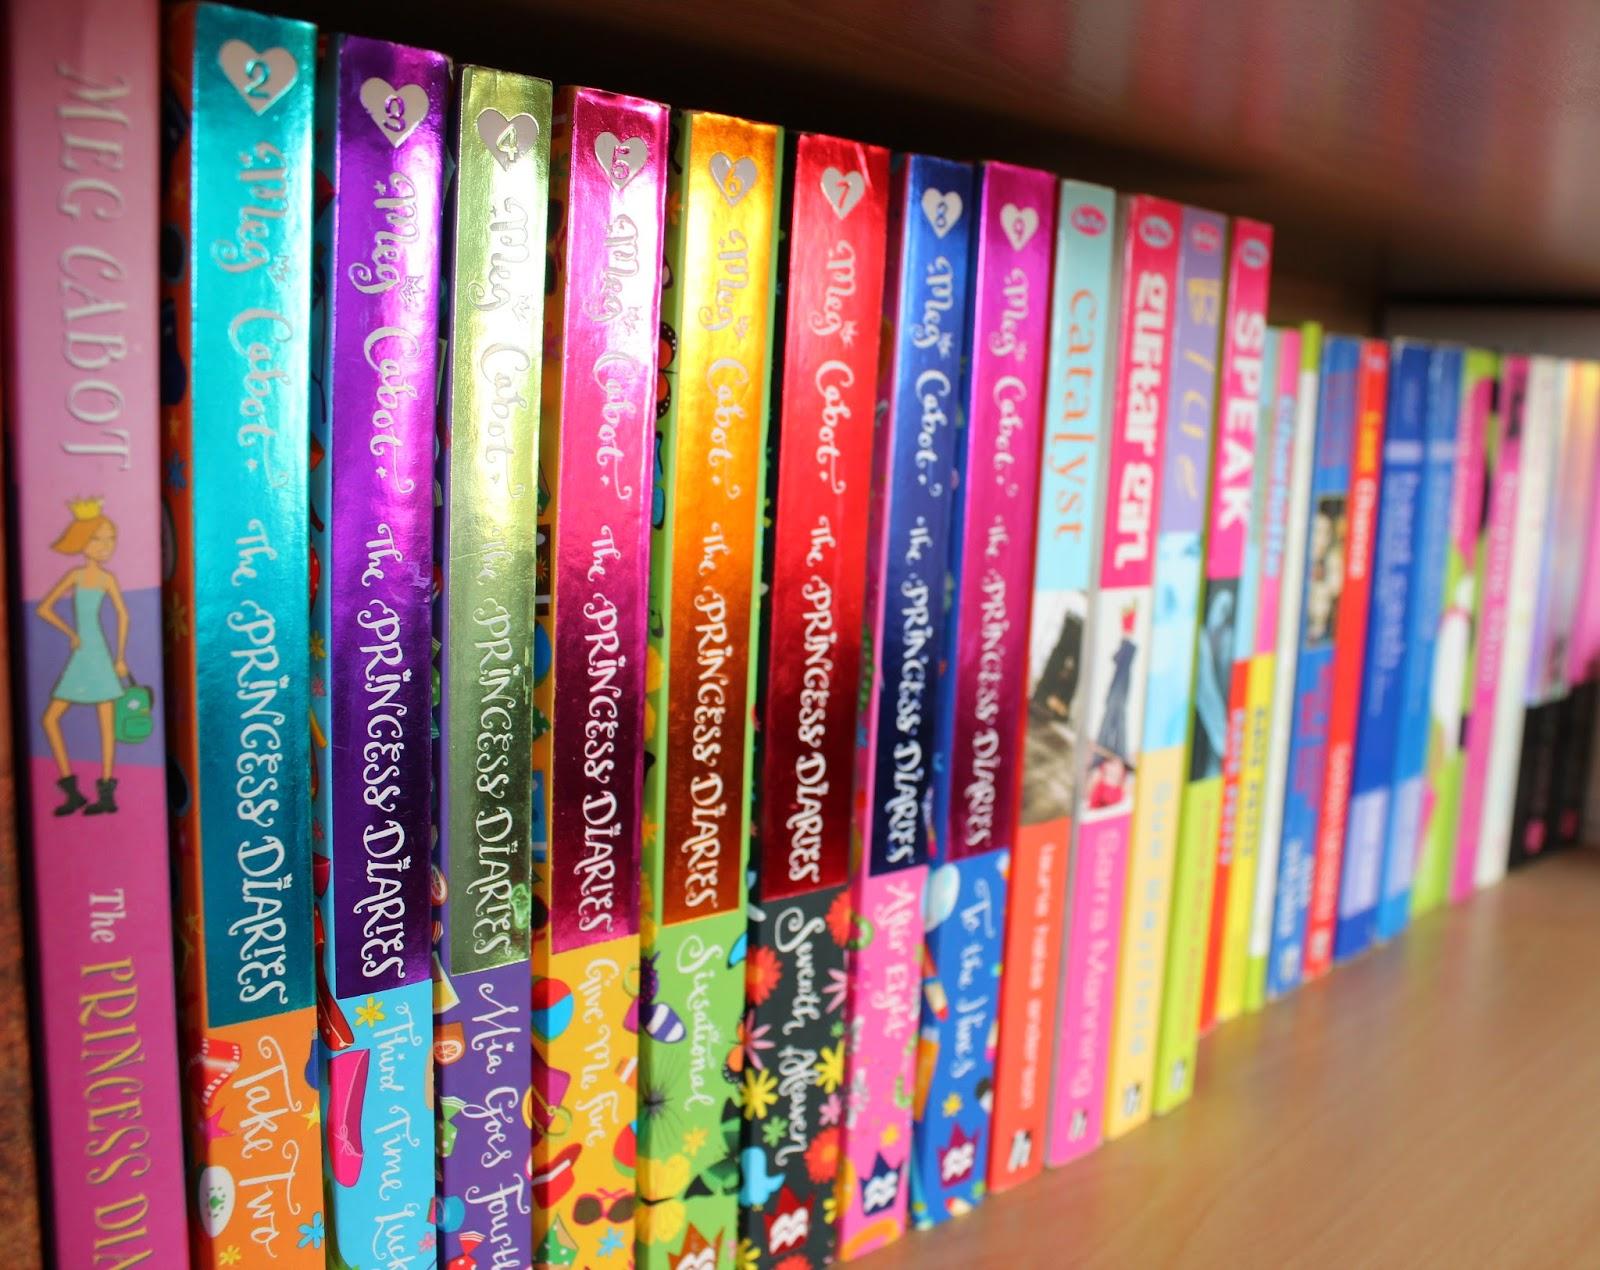 Princess Diaries Bookshelf